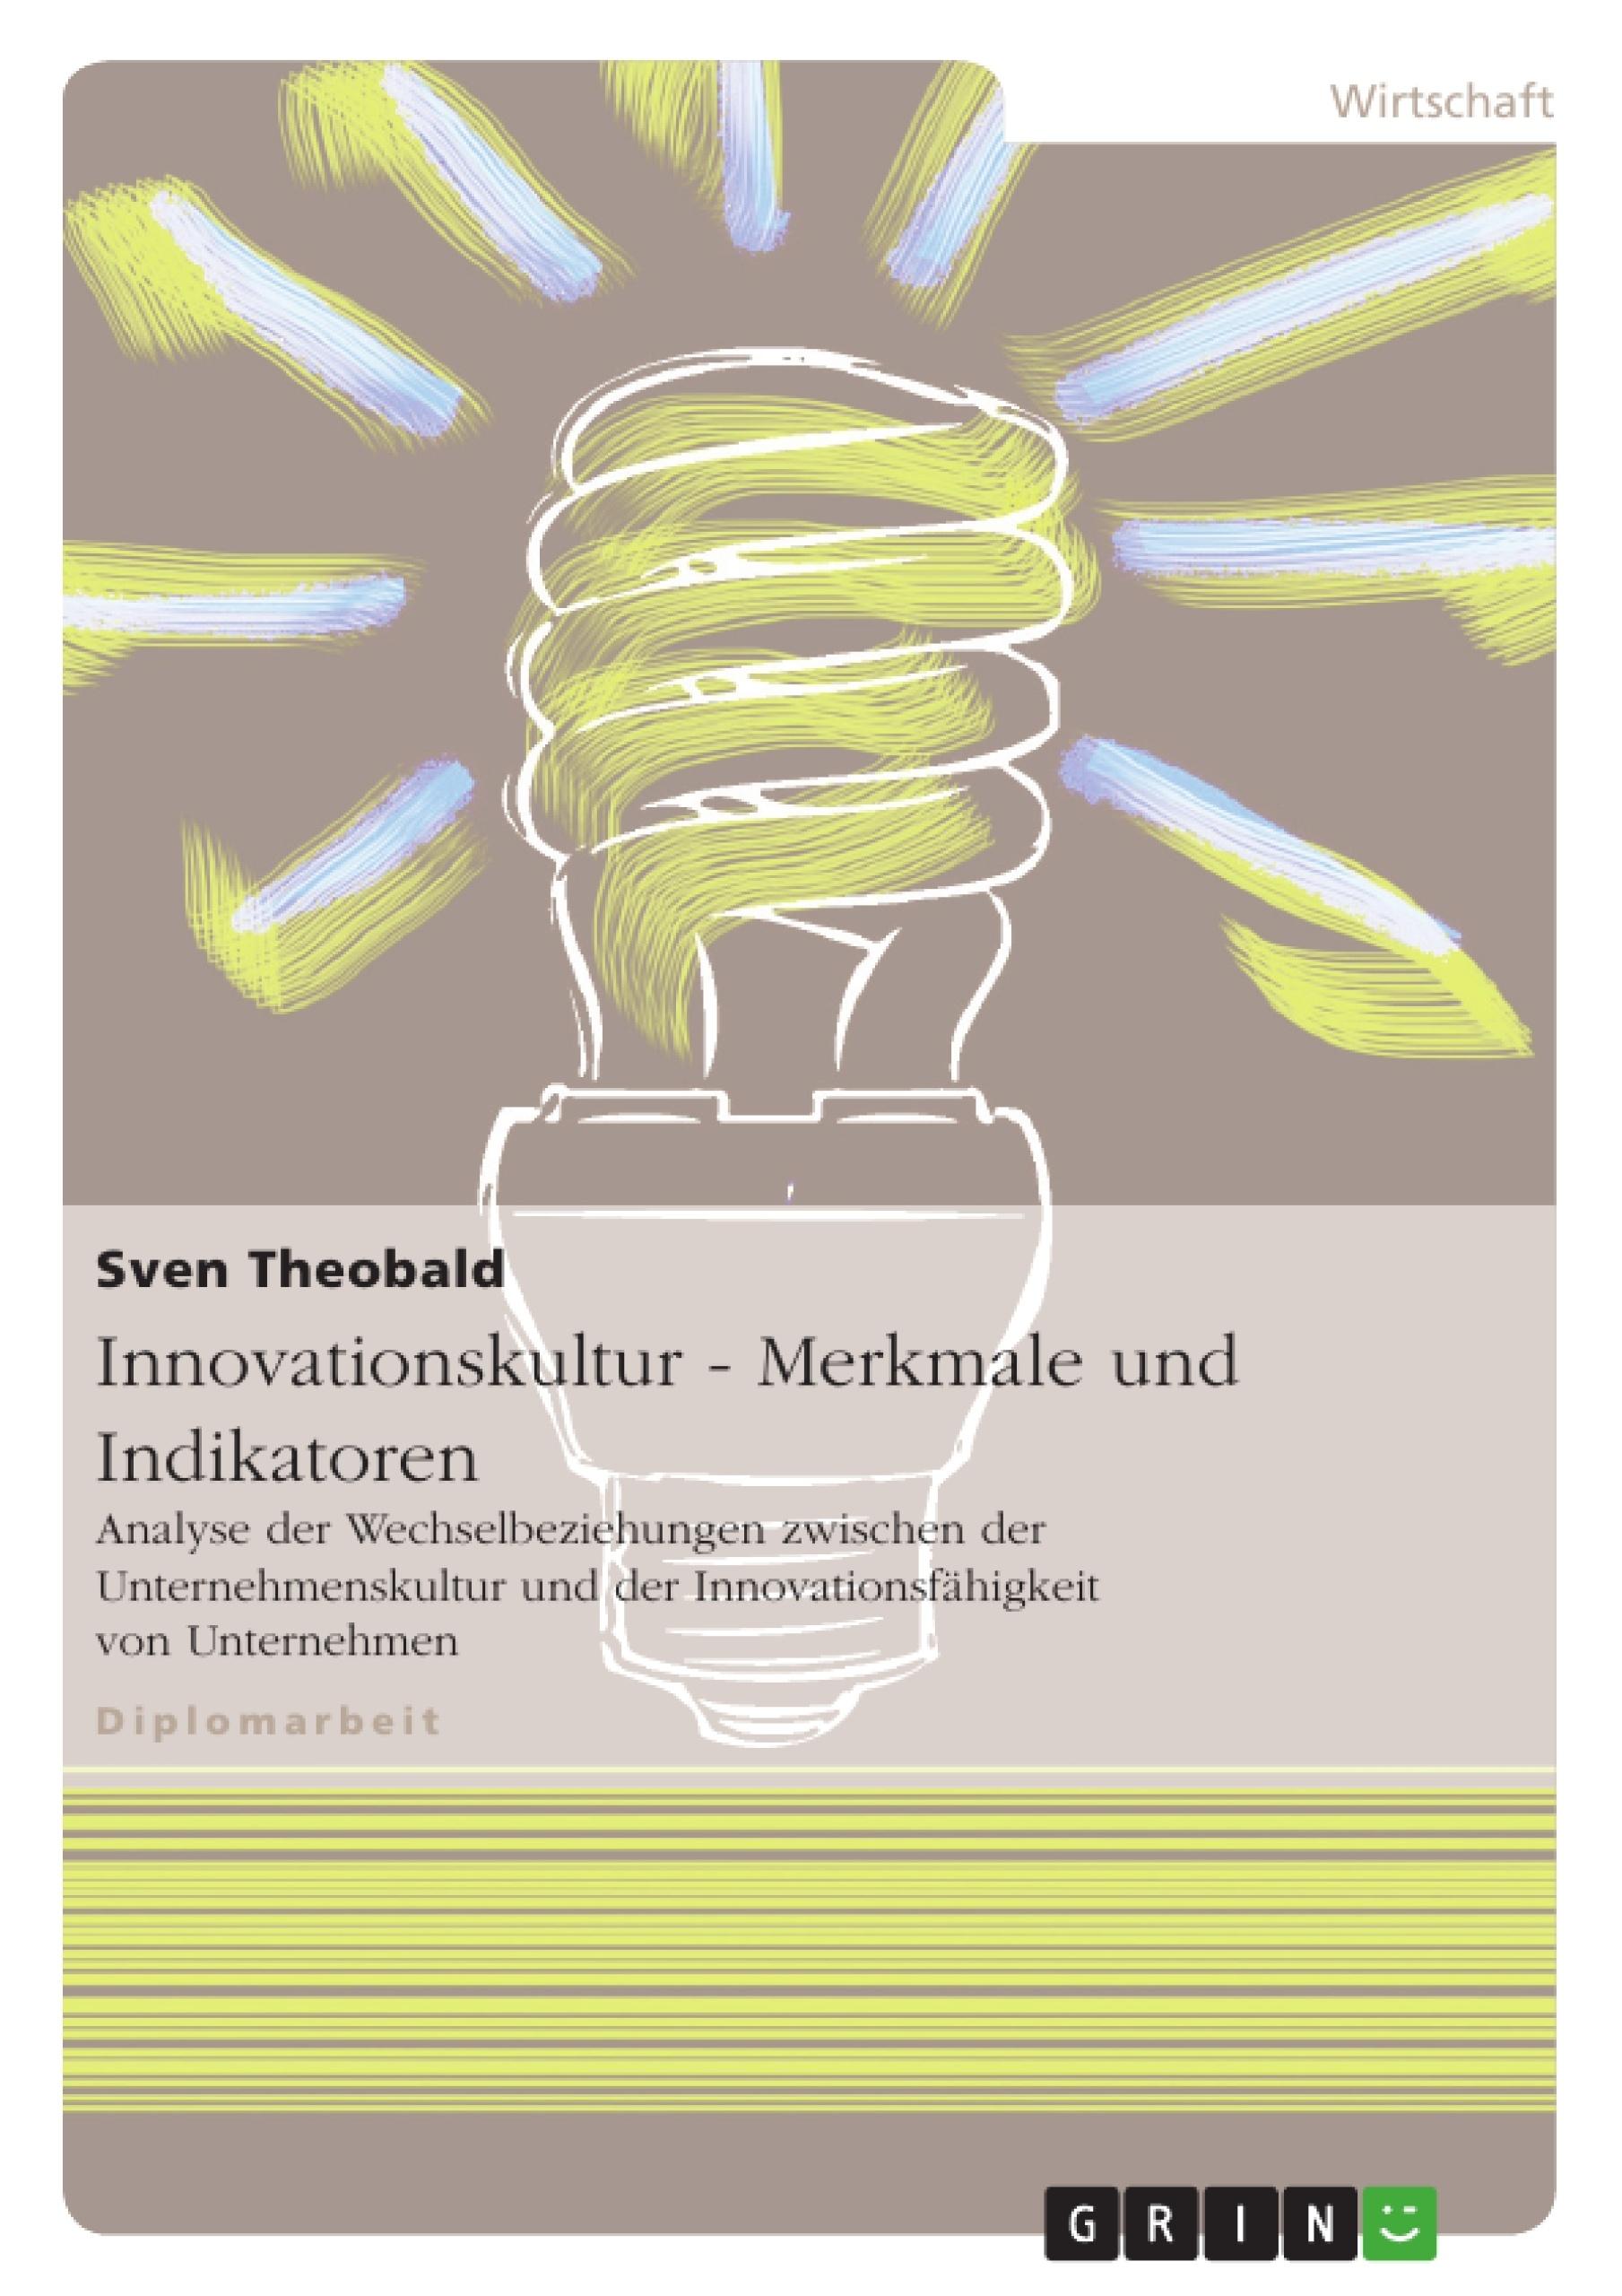 Titel: Innovationskultur - Merkmale und Indikatoren